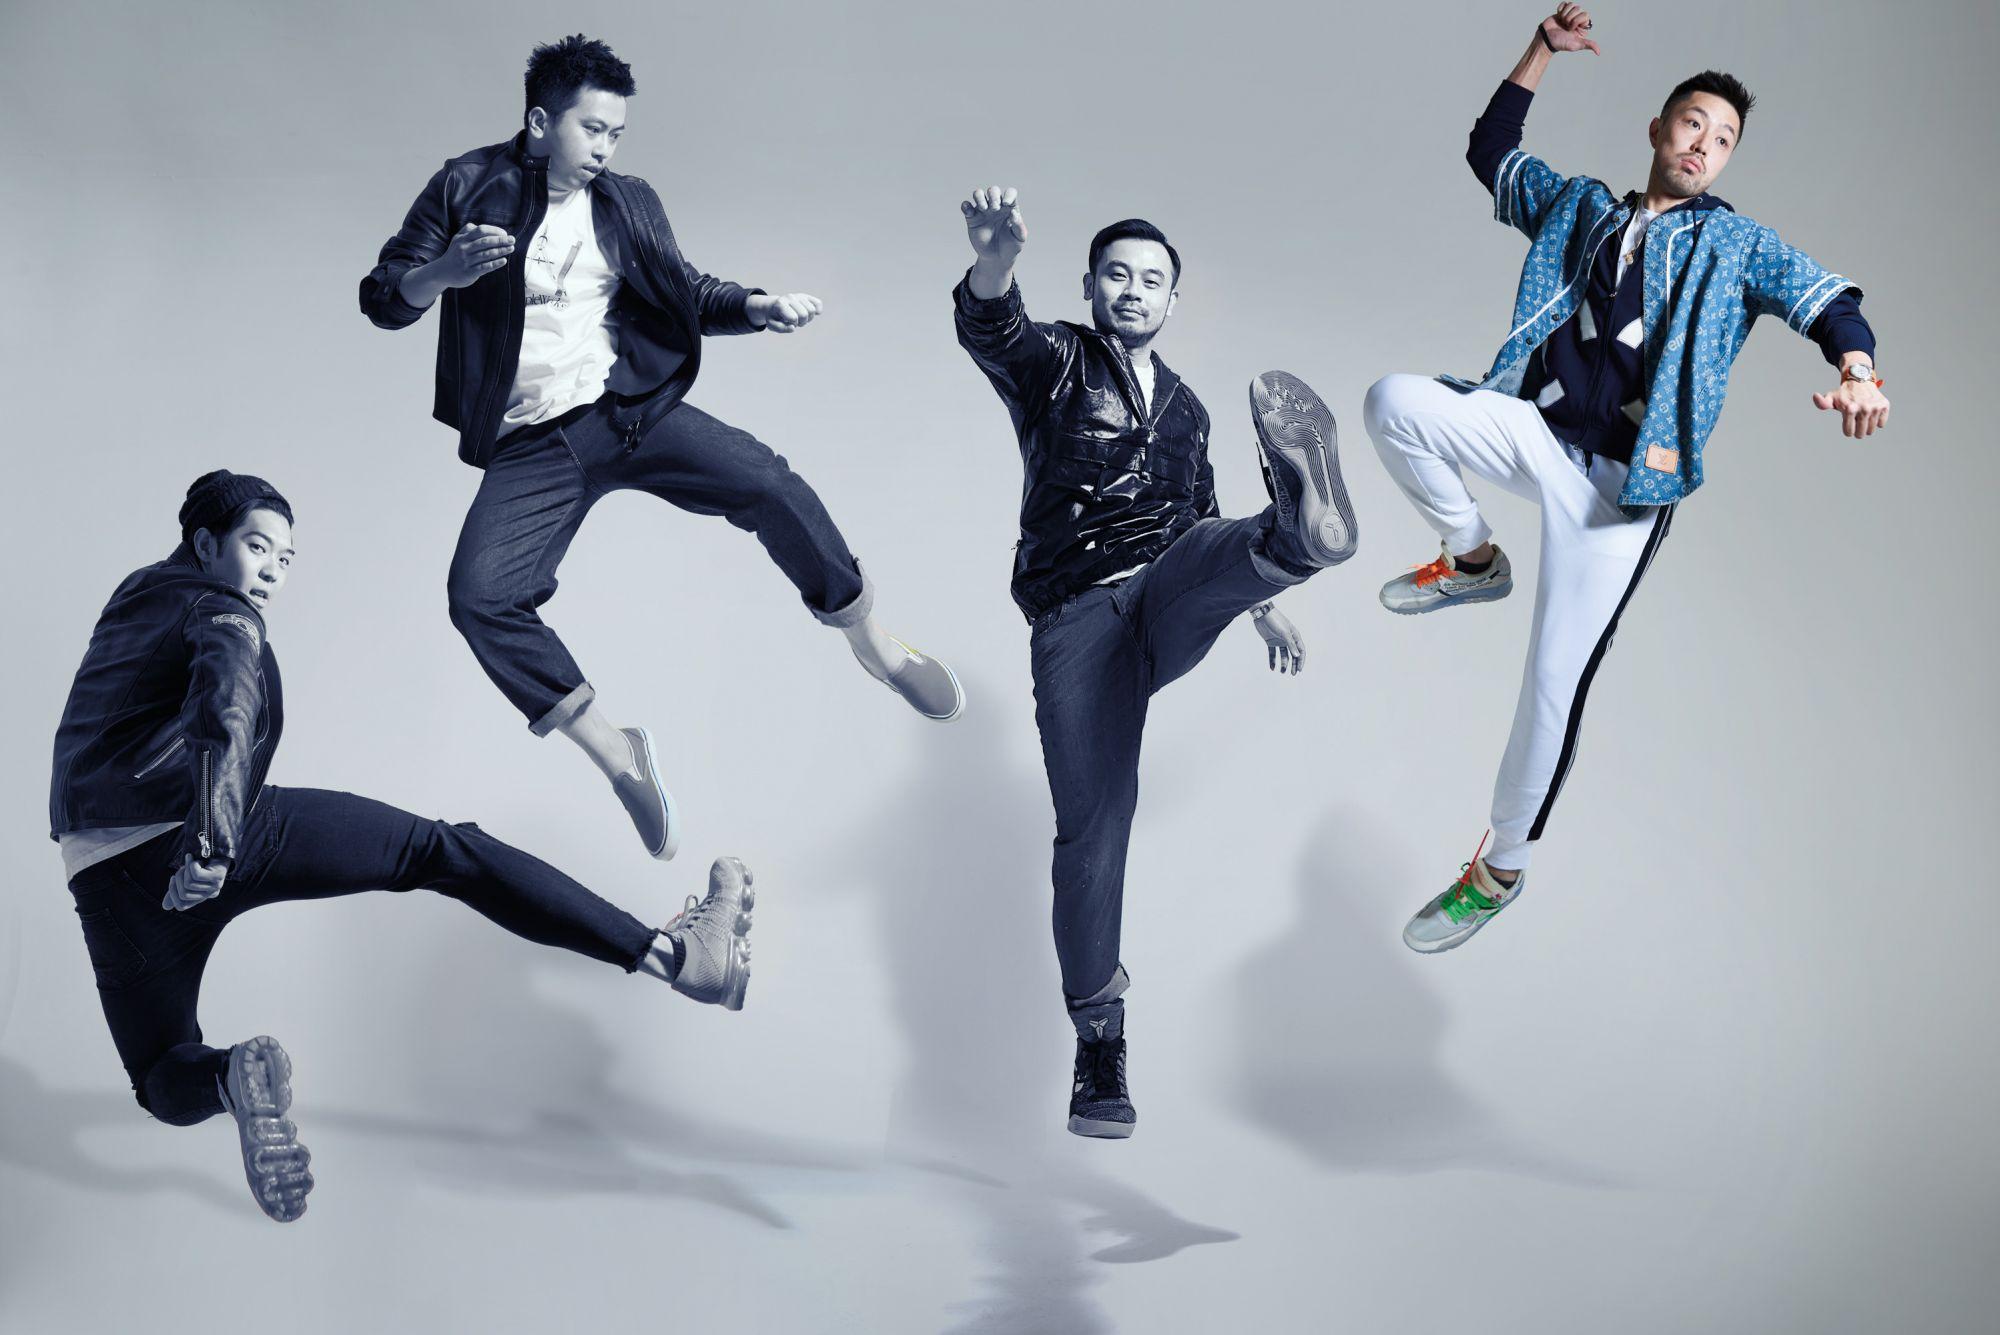 HK Sneakerheads: Ryan Sun's Best Tip For Sneaker Collectors